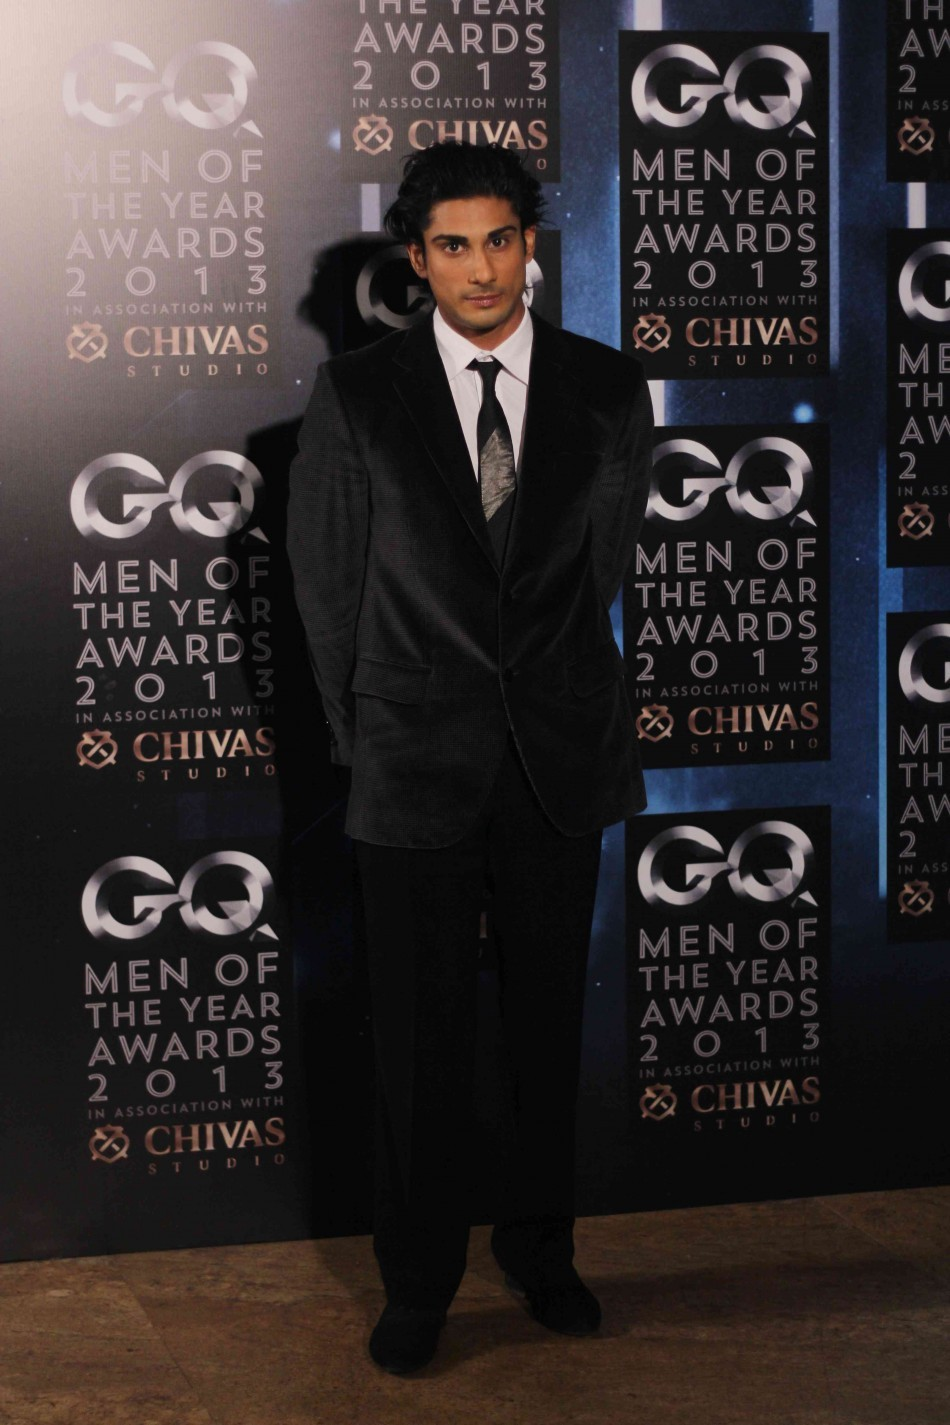 GQ Men of the Year Award 2013